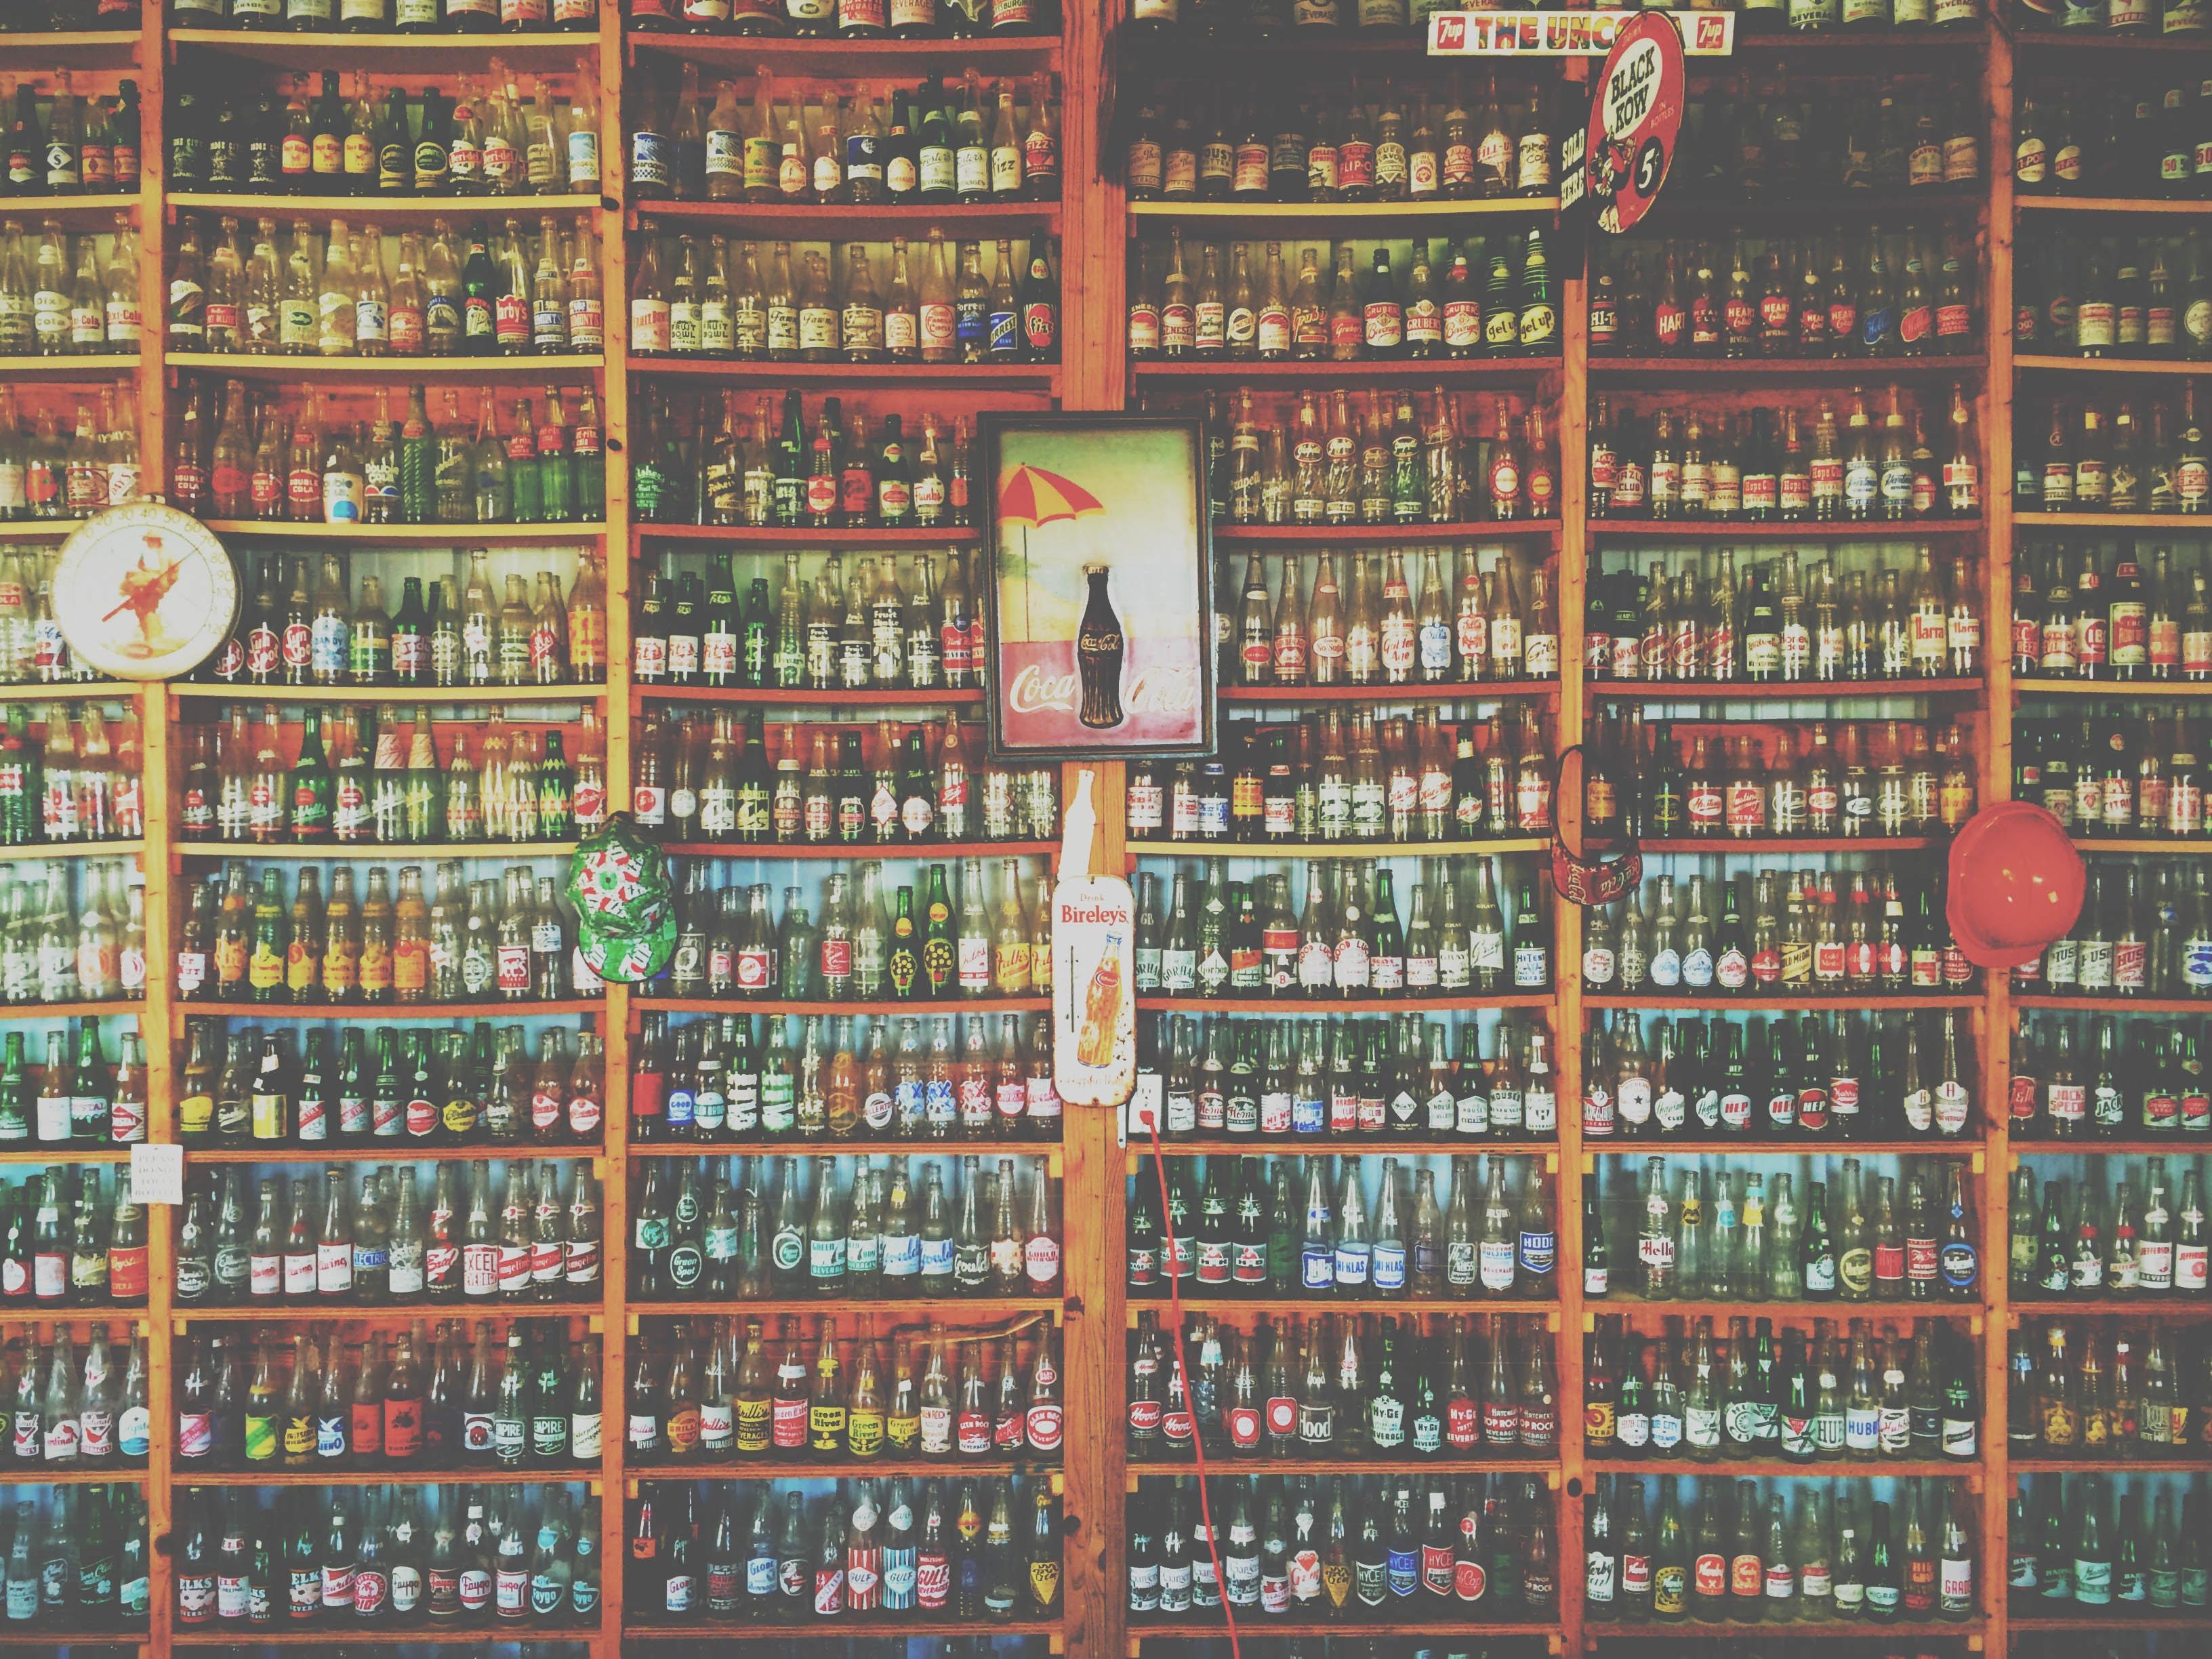 A collection of vintage Coca-Cola bottles on a large shelf.